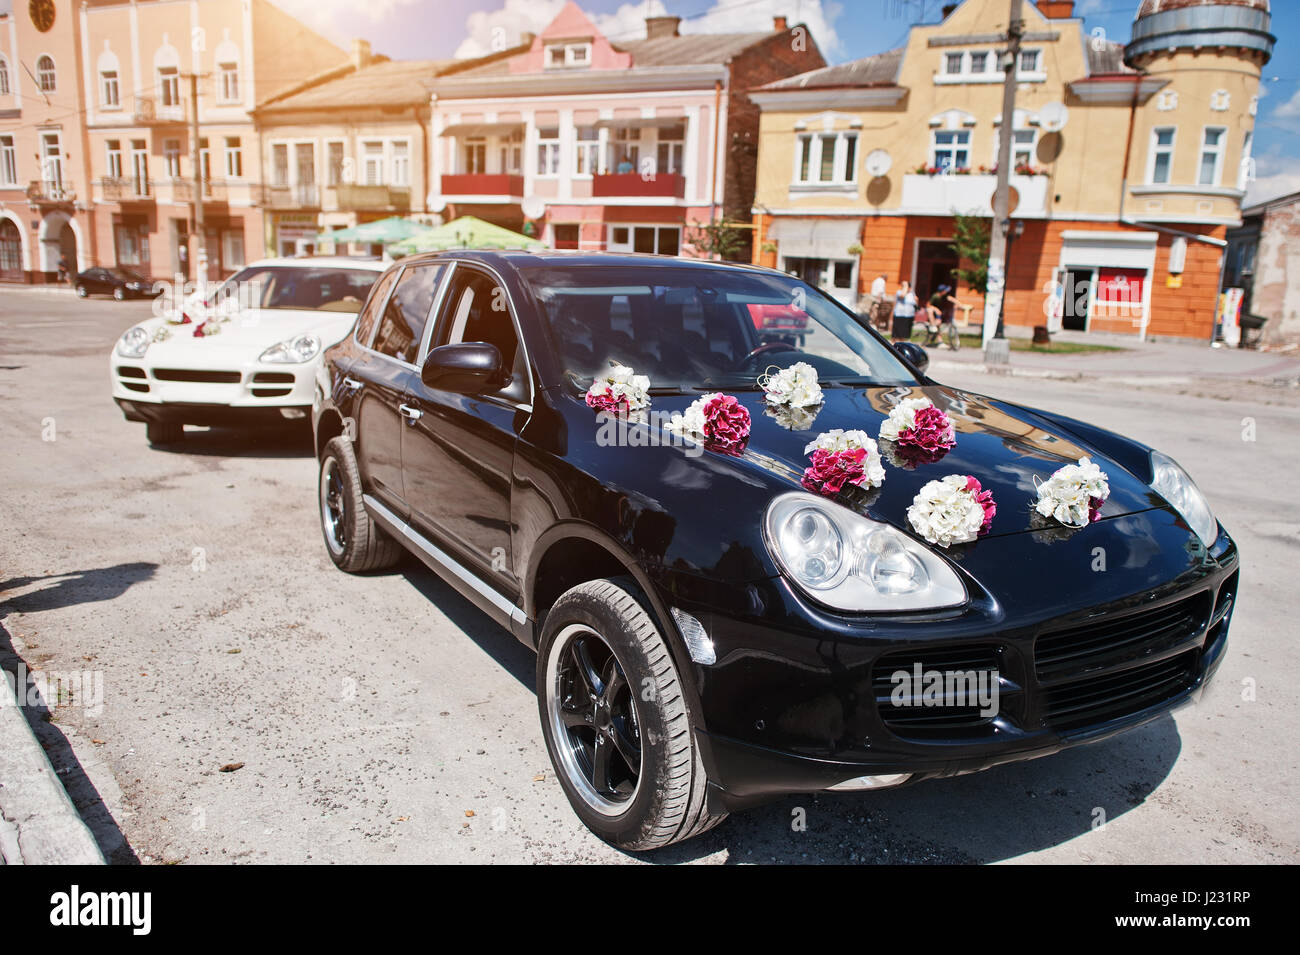 Elegant Wedding Cars With Decor On The Hood Stock Photo 138979562